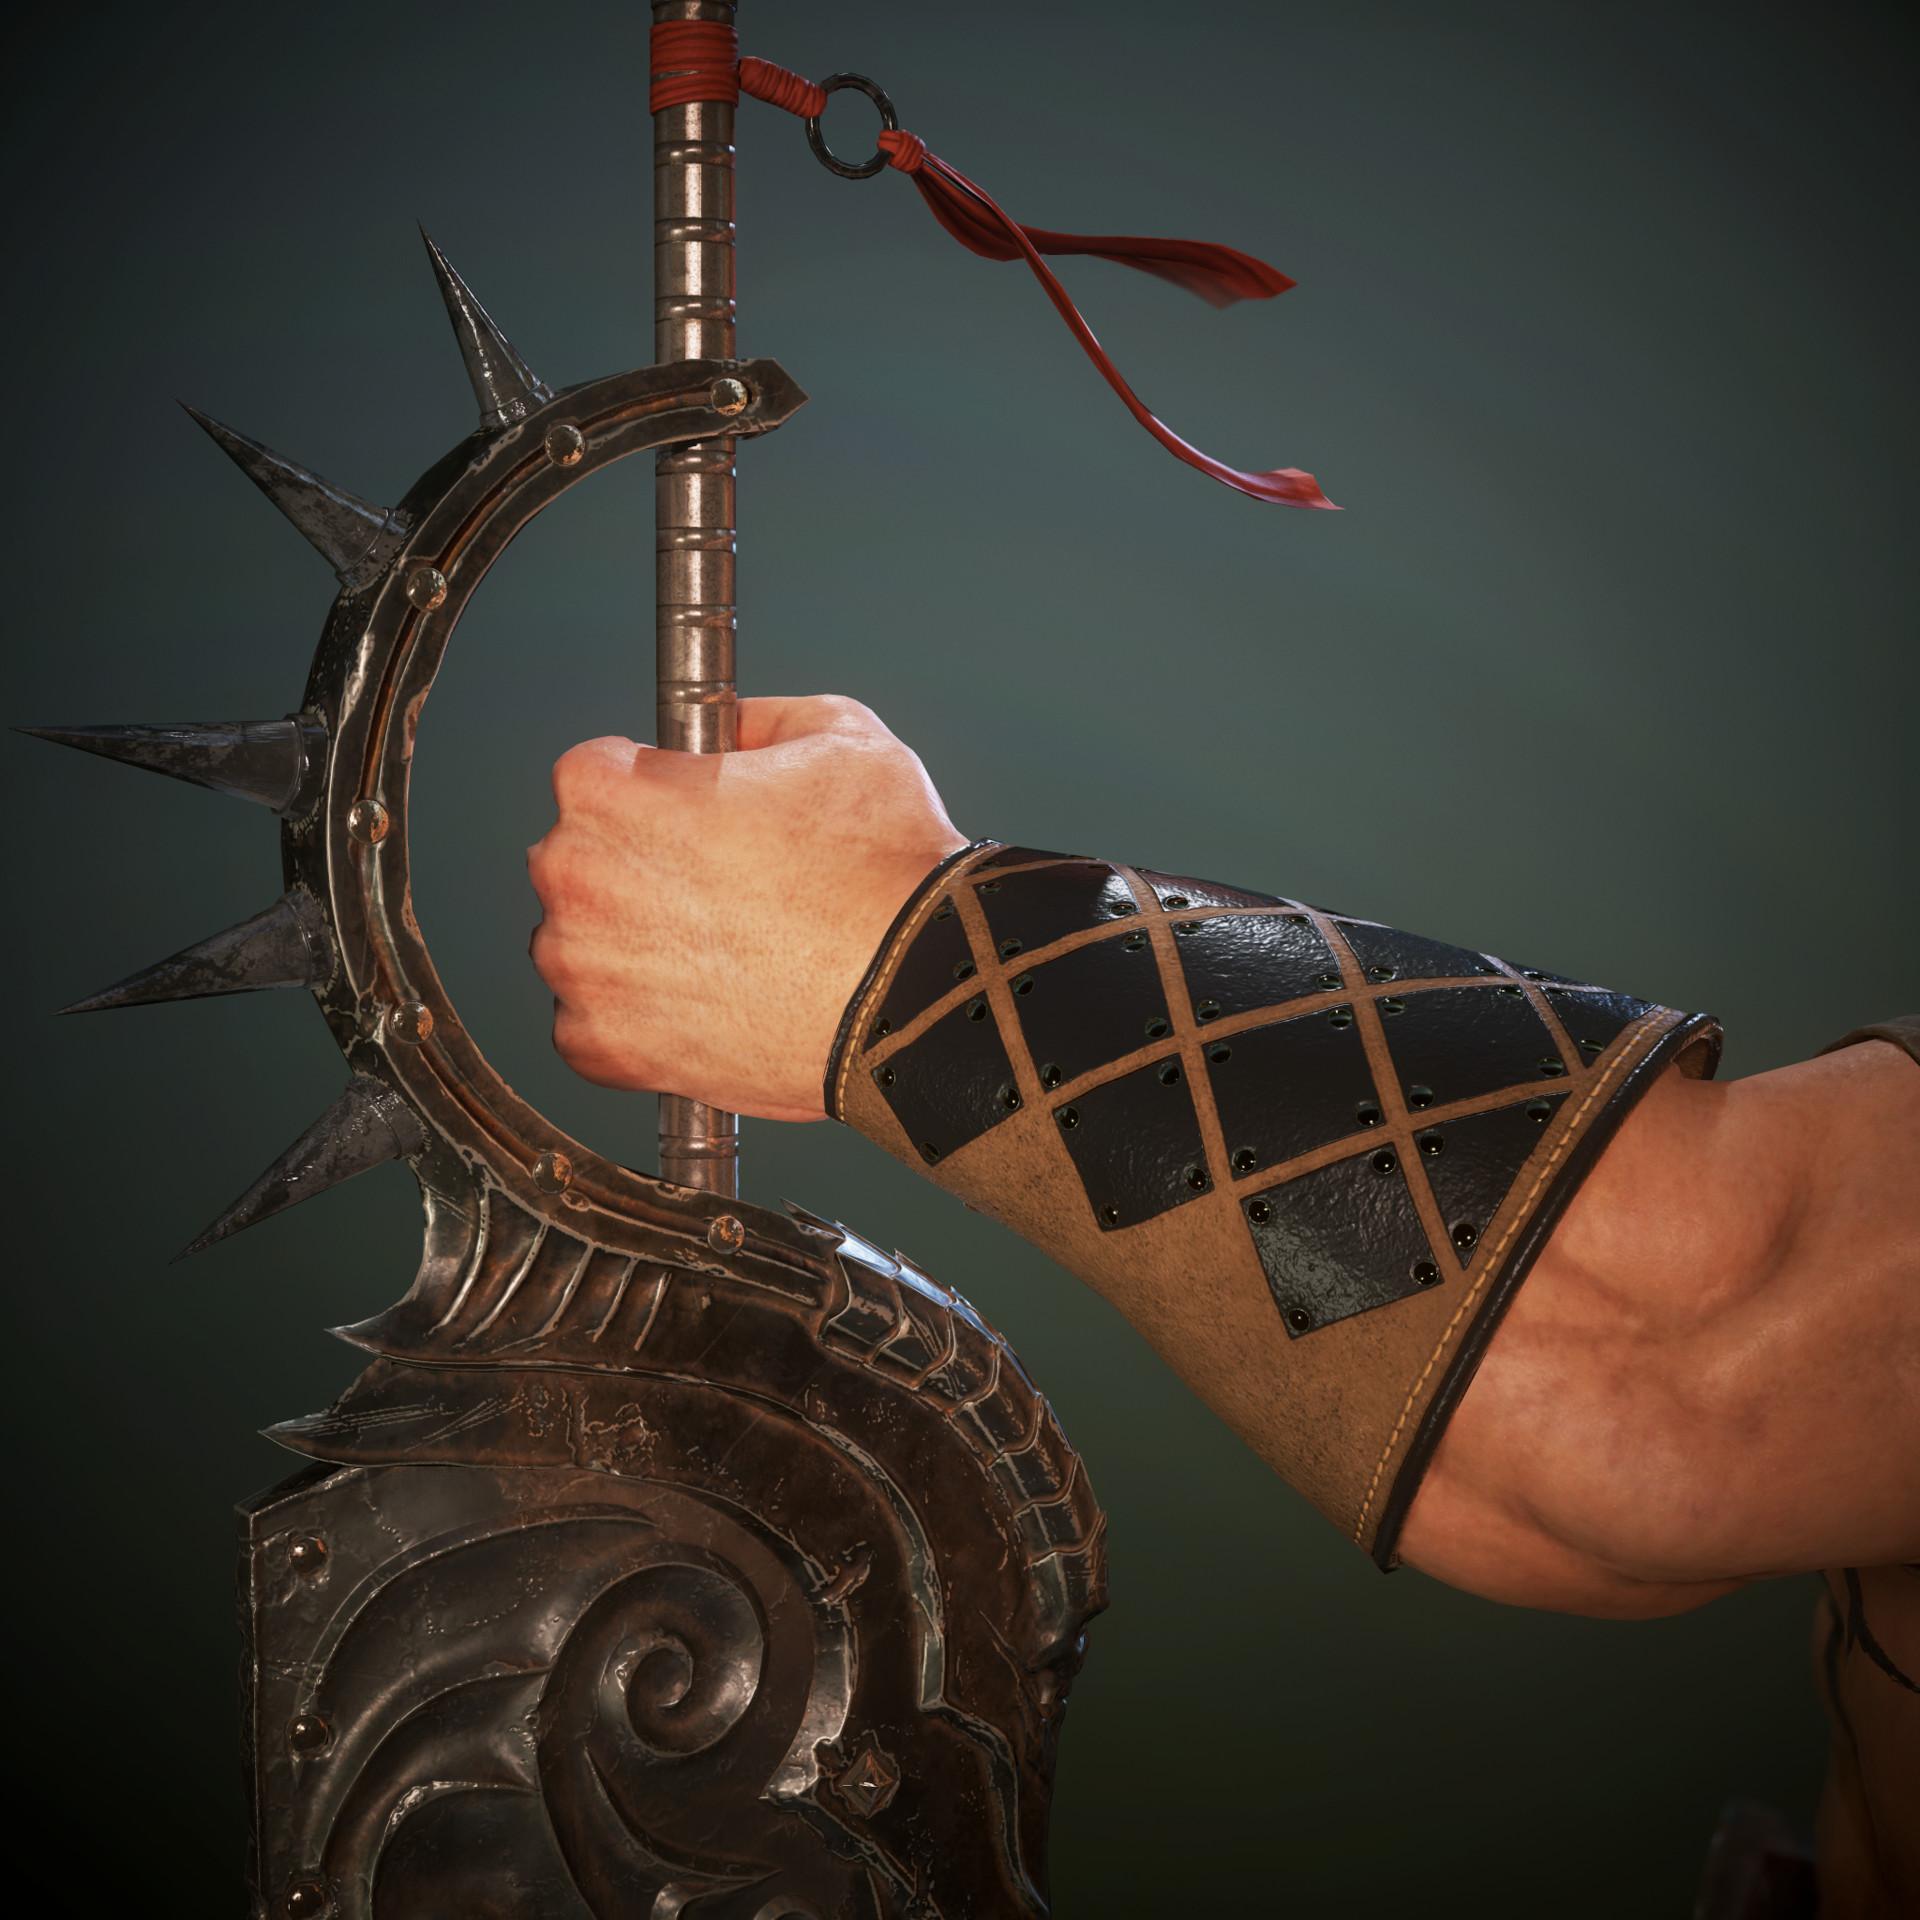 Danaos christopoulos sb wrist